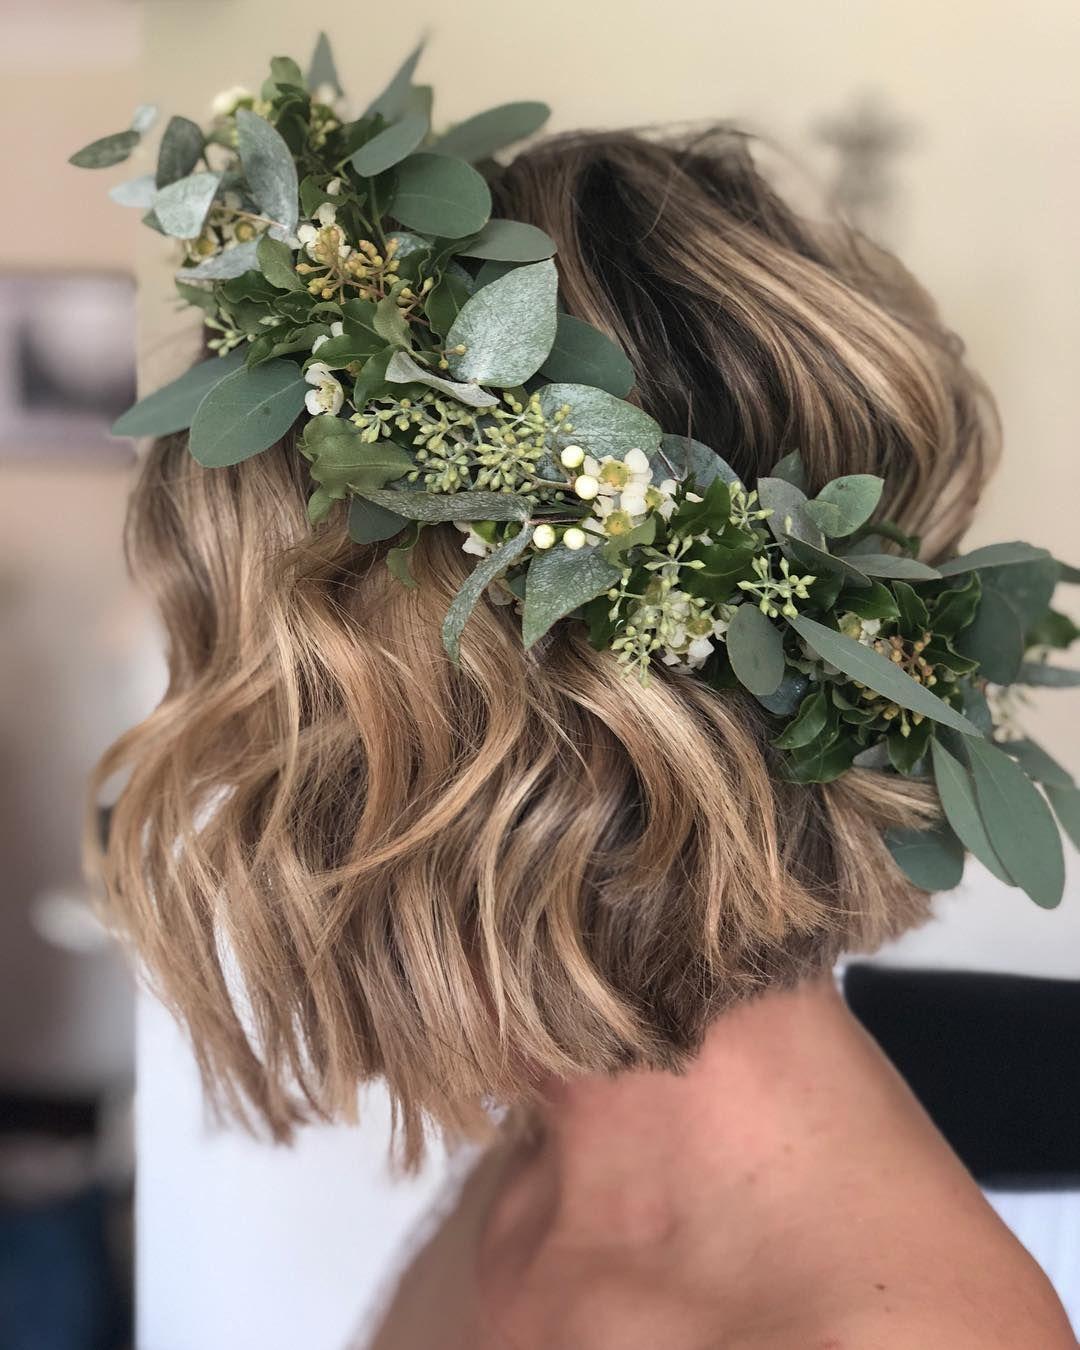 17 wedding hairstyles Short ideas